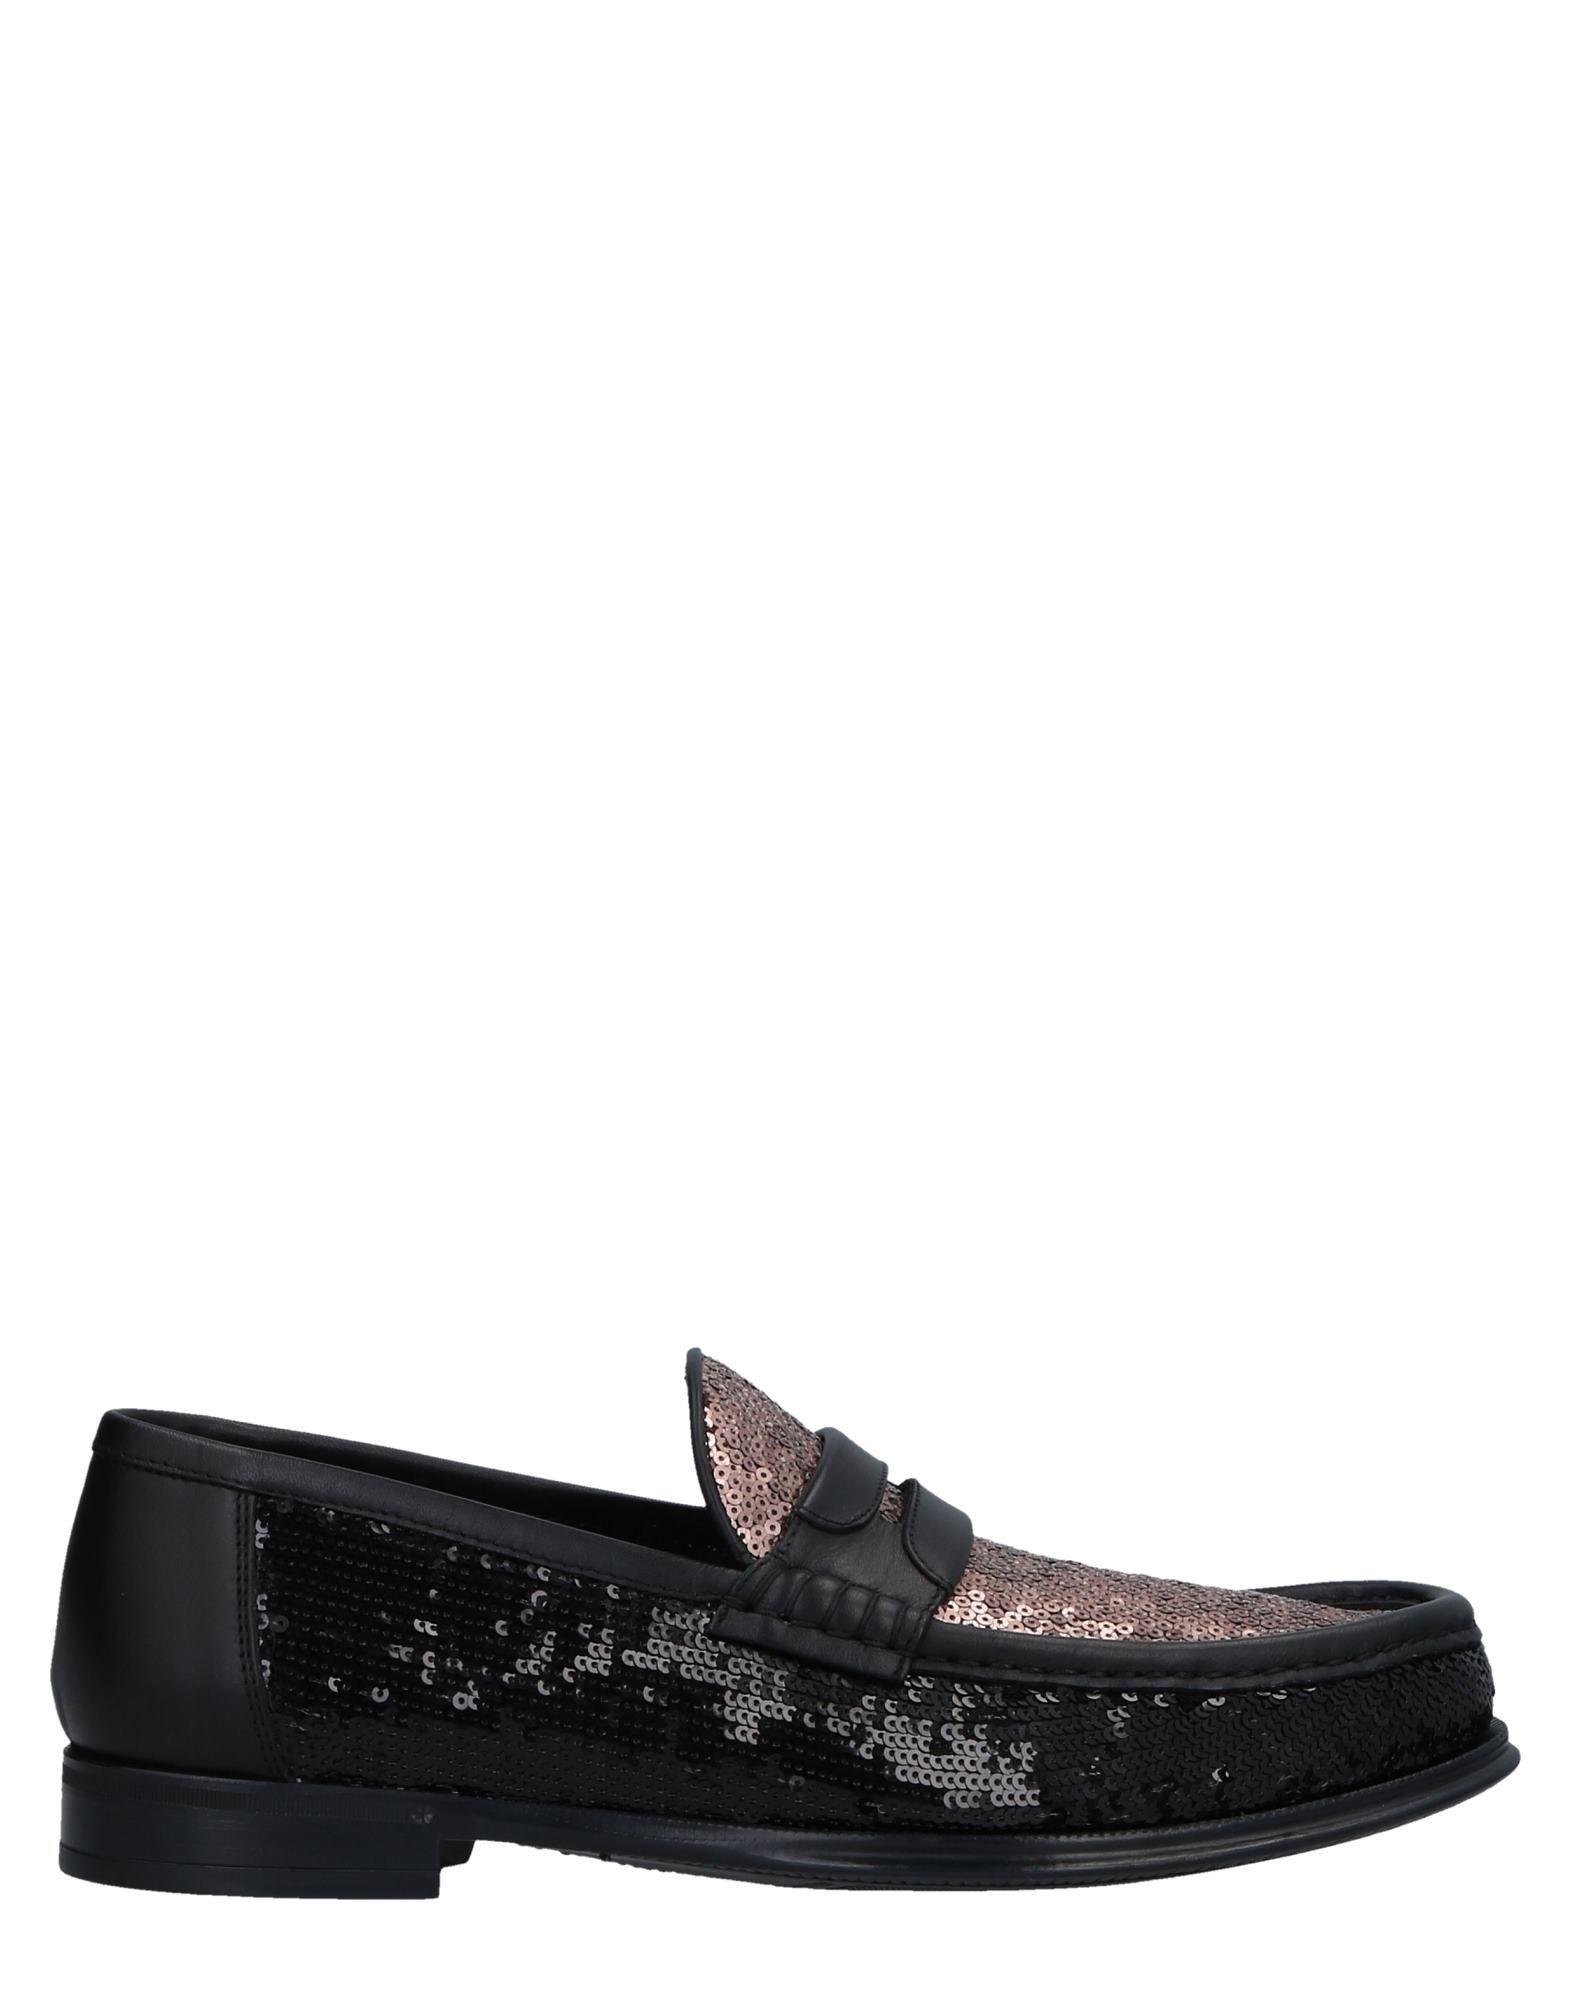 Dolce & Gabbana Mokassins Herren  11514000VE Gute Qualität beliebte Schuhe